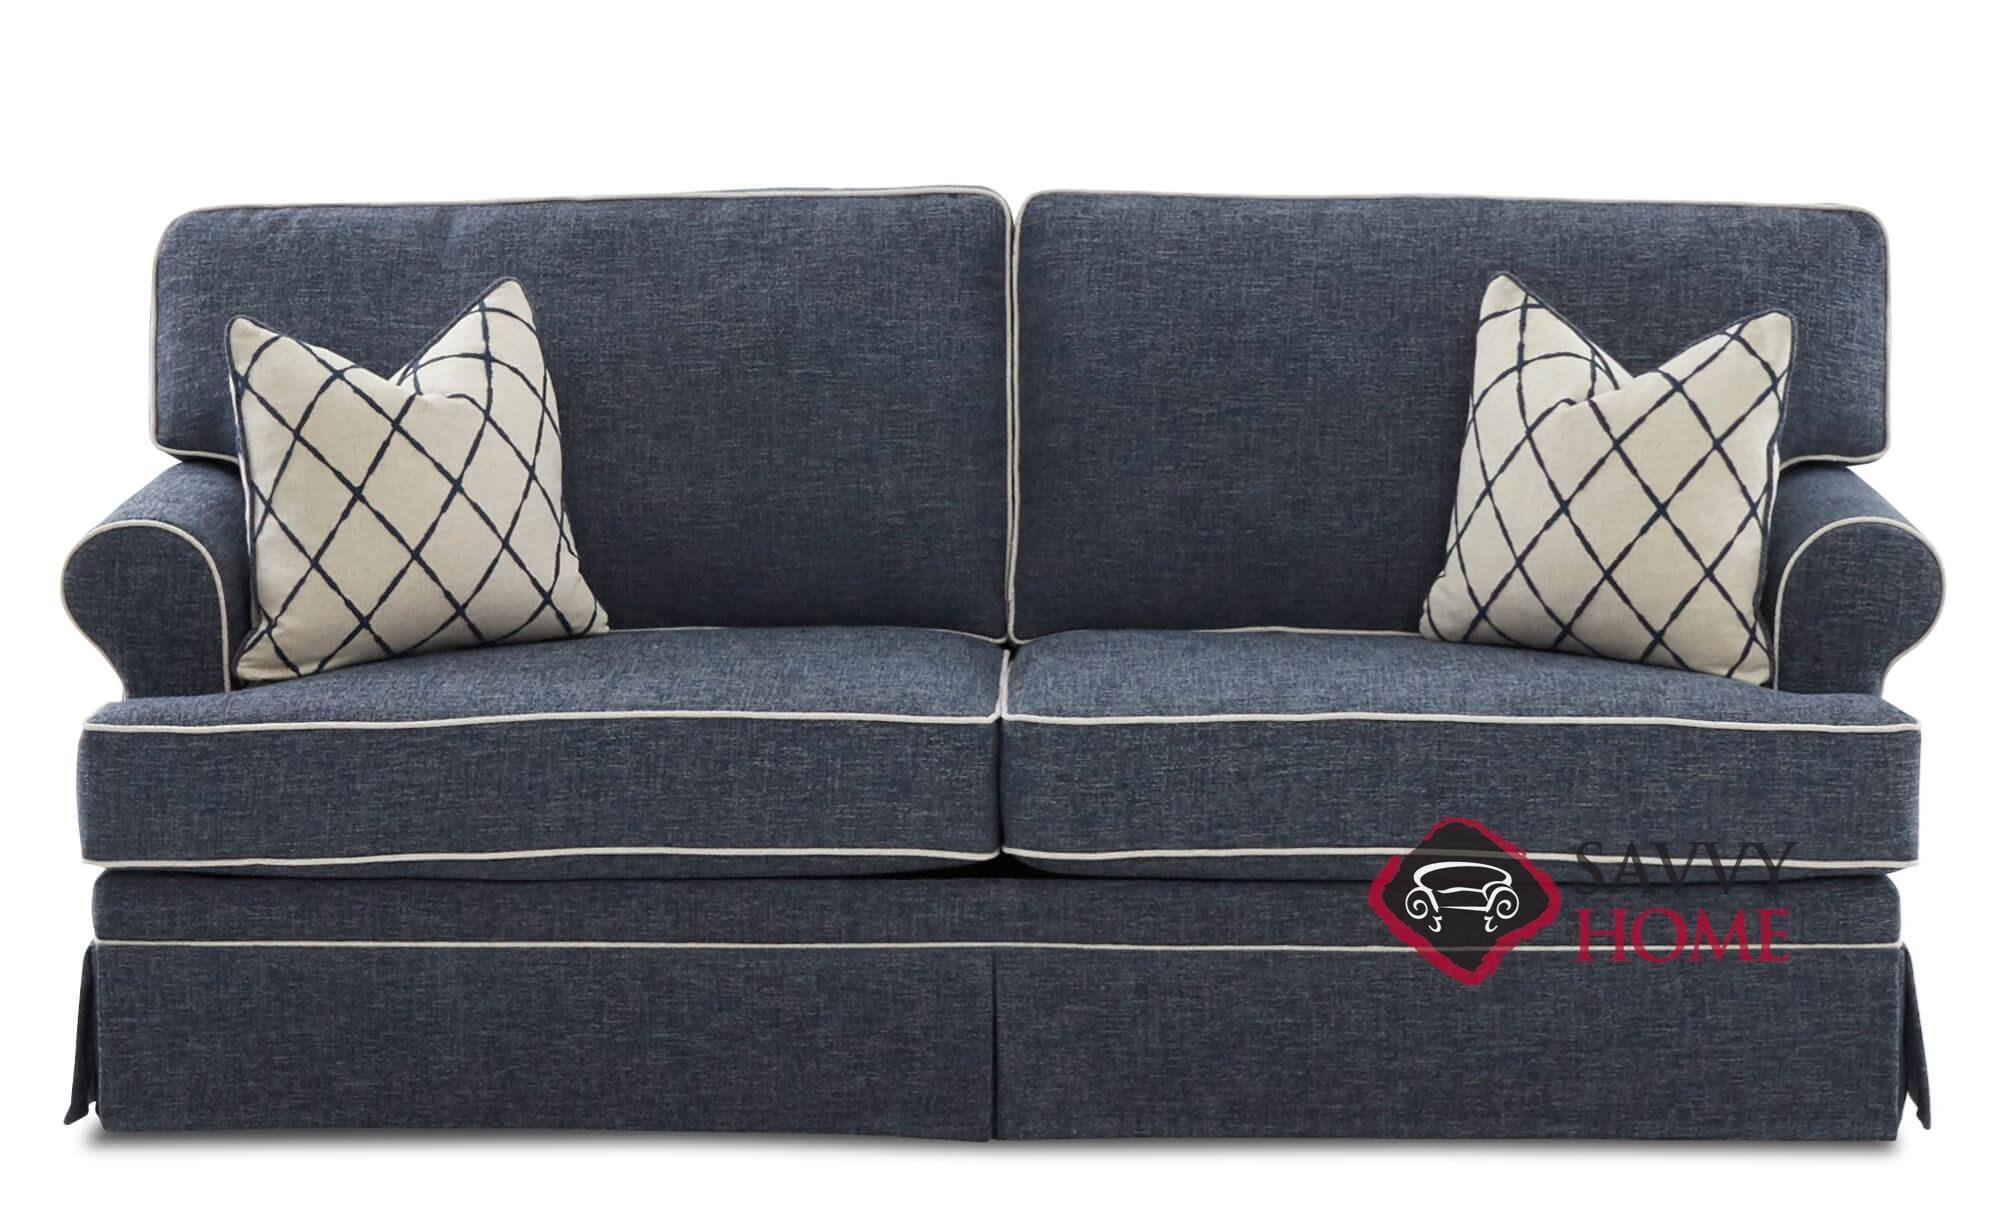 Pleasing Cranston Full Sofa Bed By Savvy Home Interior And Landscaping Sapresignezvosmurscom